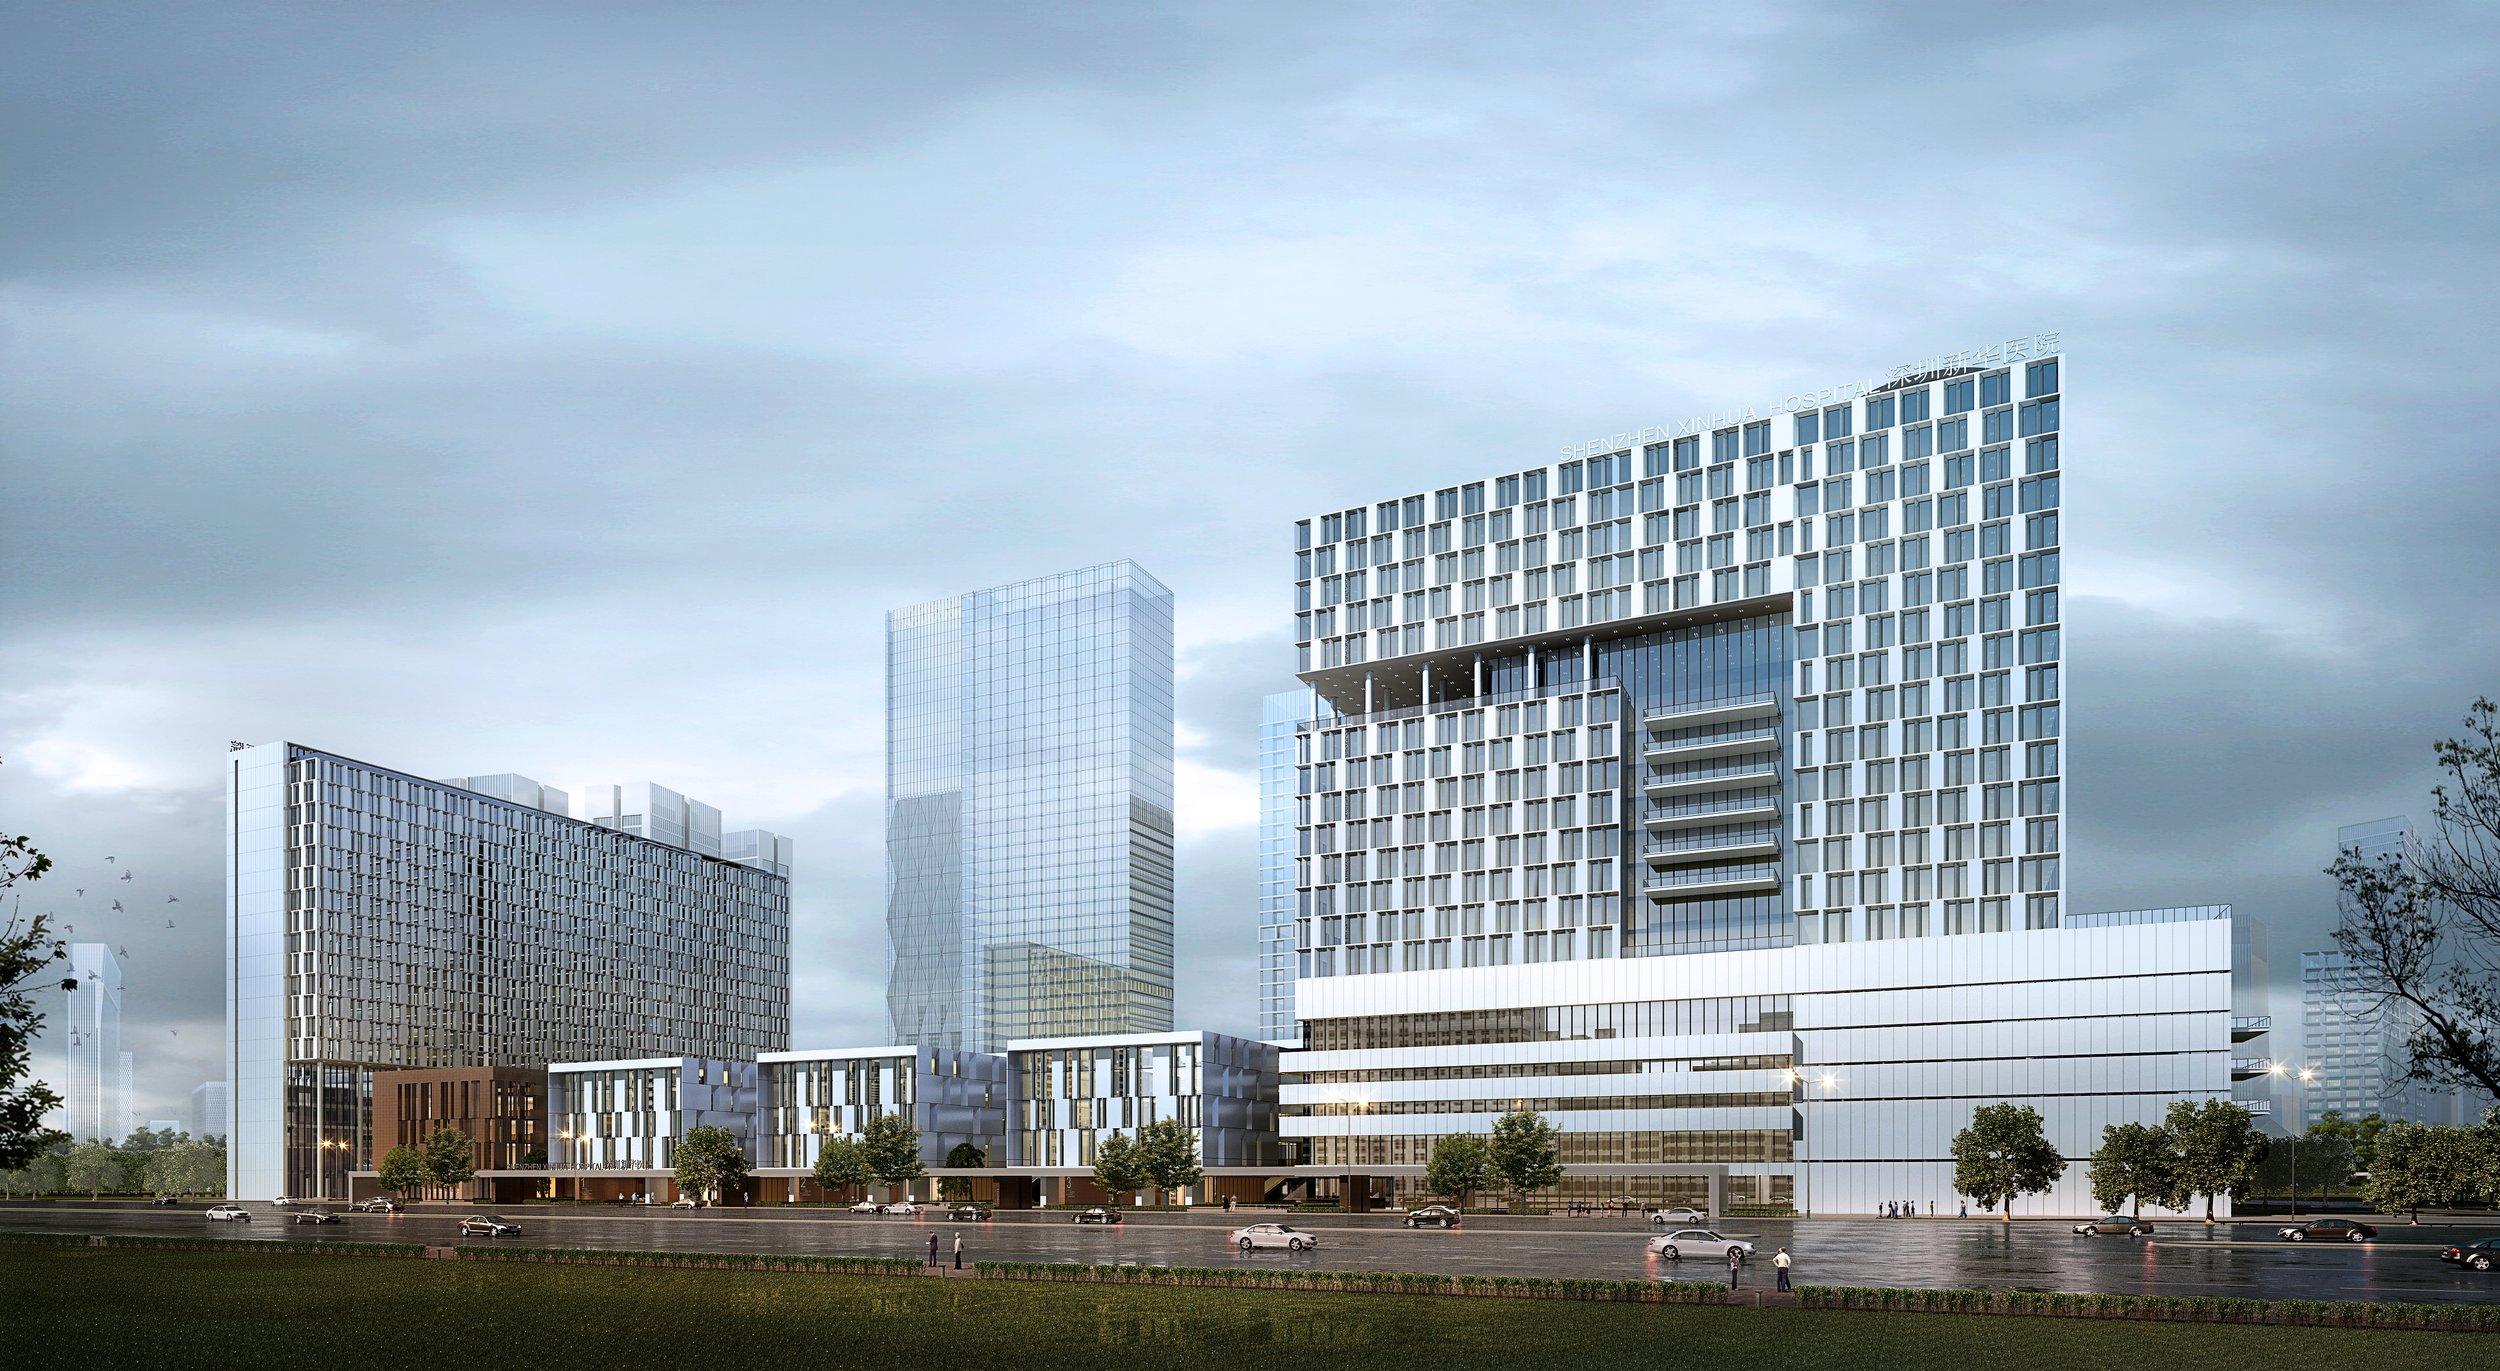 Shenzhen Peking University Xinhua Hospital